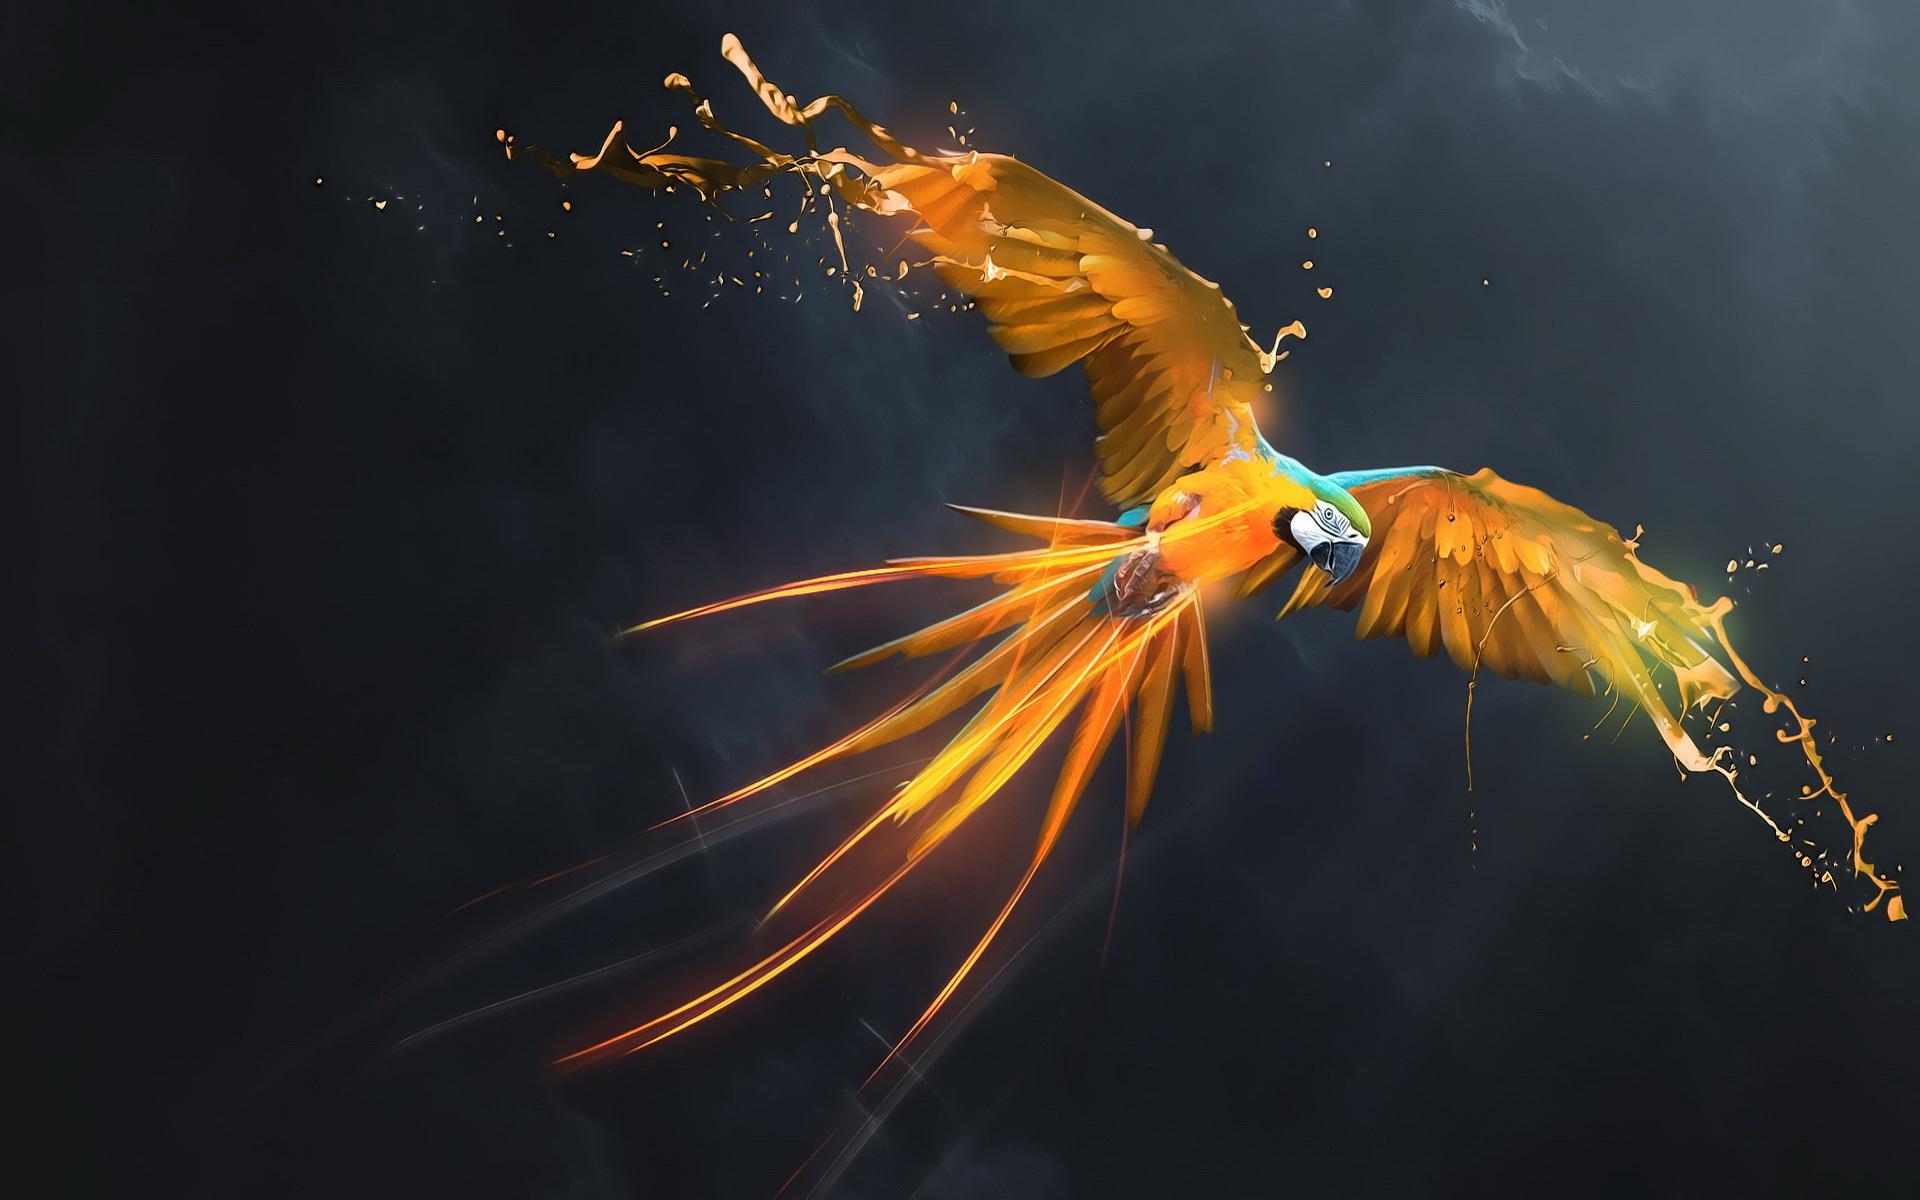 Macaw Full Hd